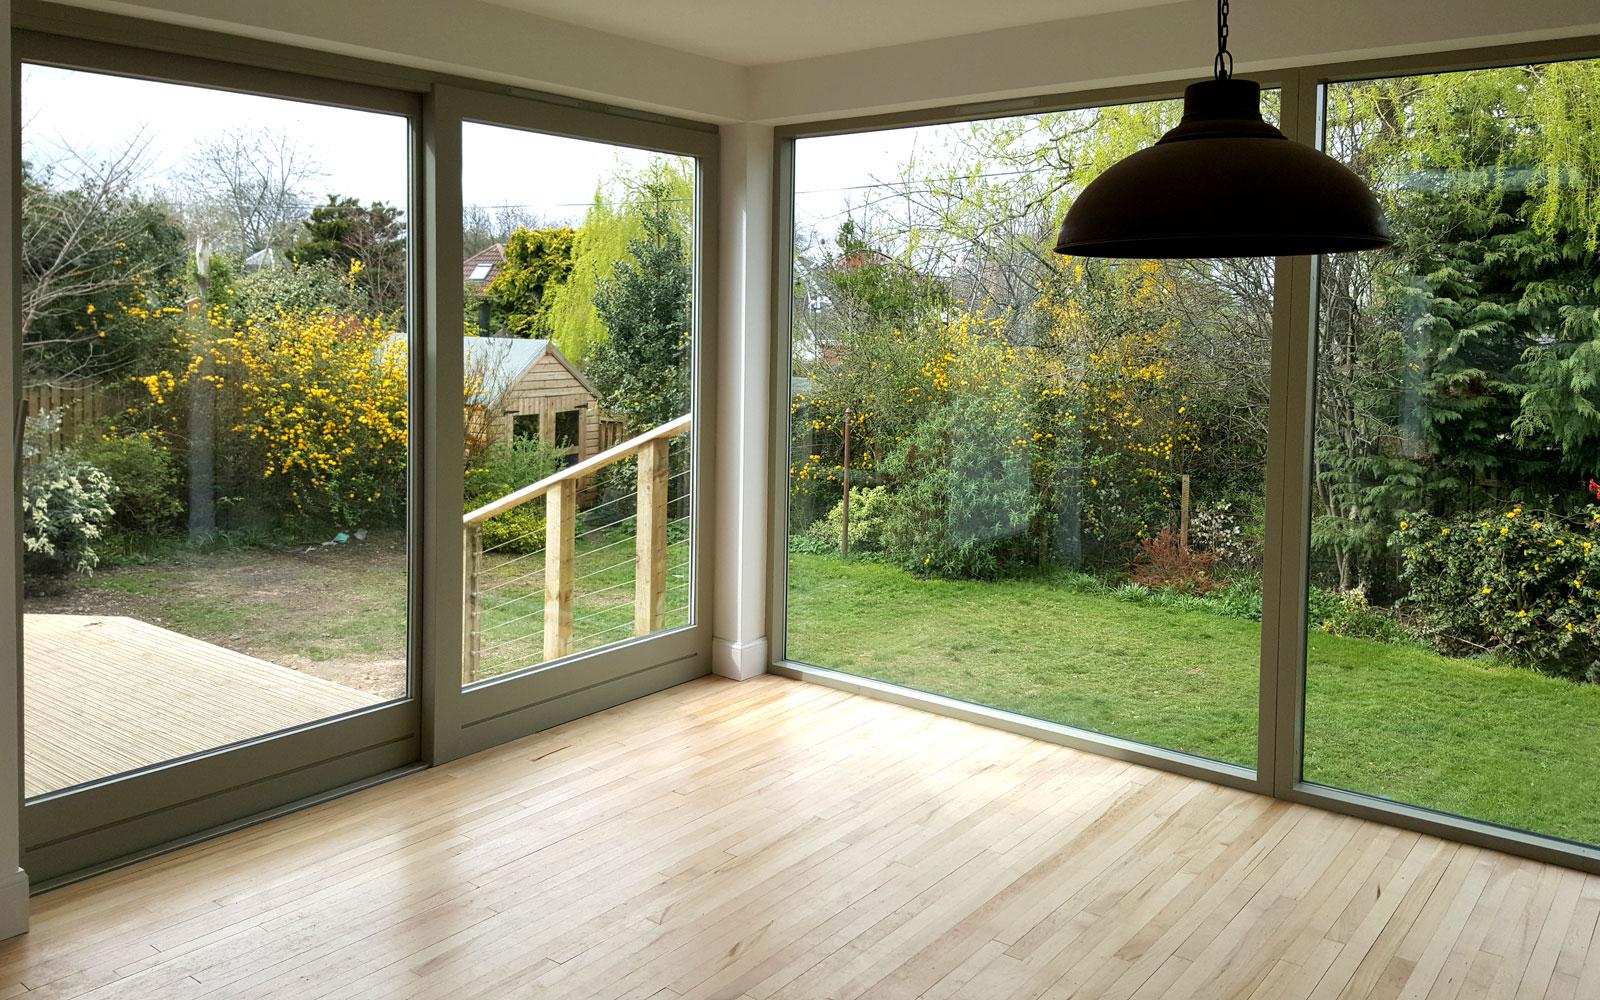 Our home extension service also includes conservatories, orangeries plus loft, basement and garage conversions.